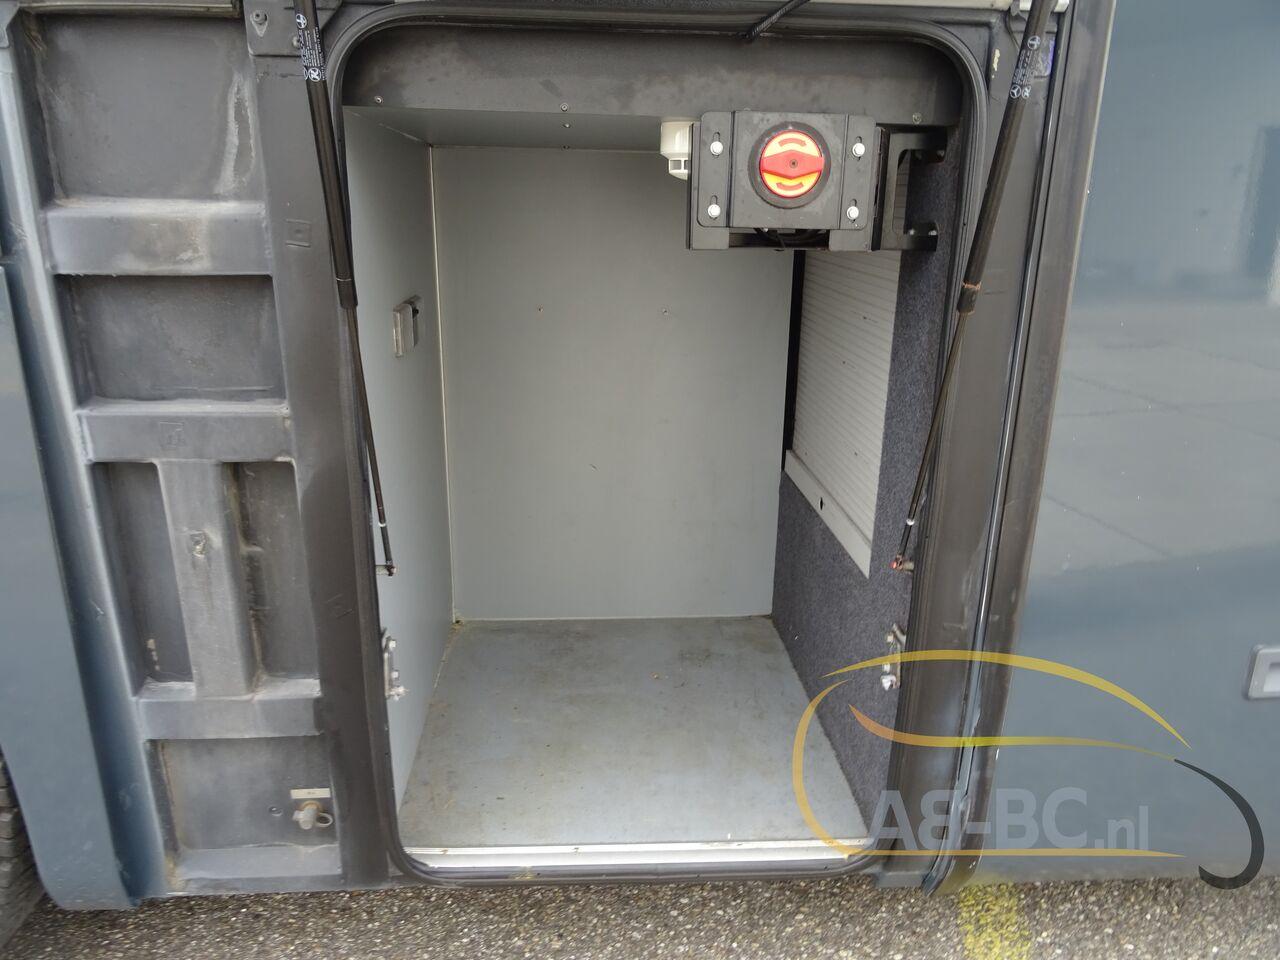 coach-busSETRA-S415-GT-HD-FINAL-EDITION---1627456873419883074_big_aa4b8758b34a247db0702a0160dc9457--21050713010665719300